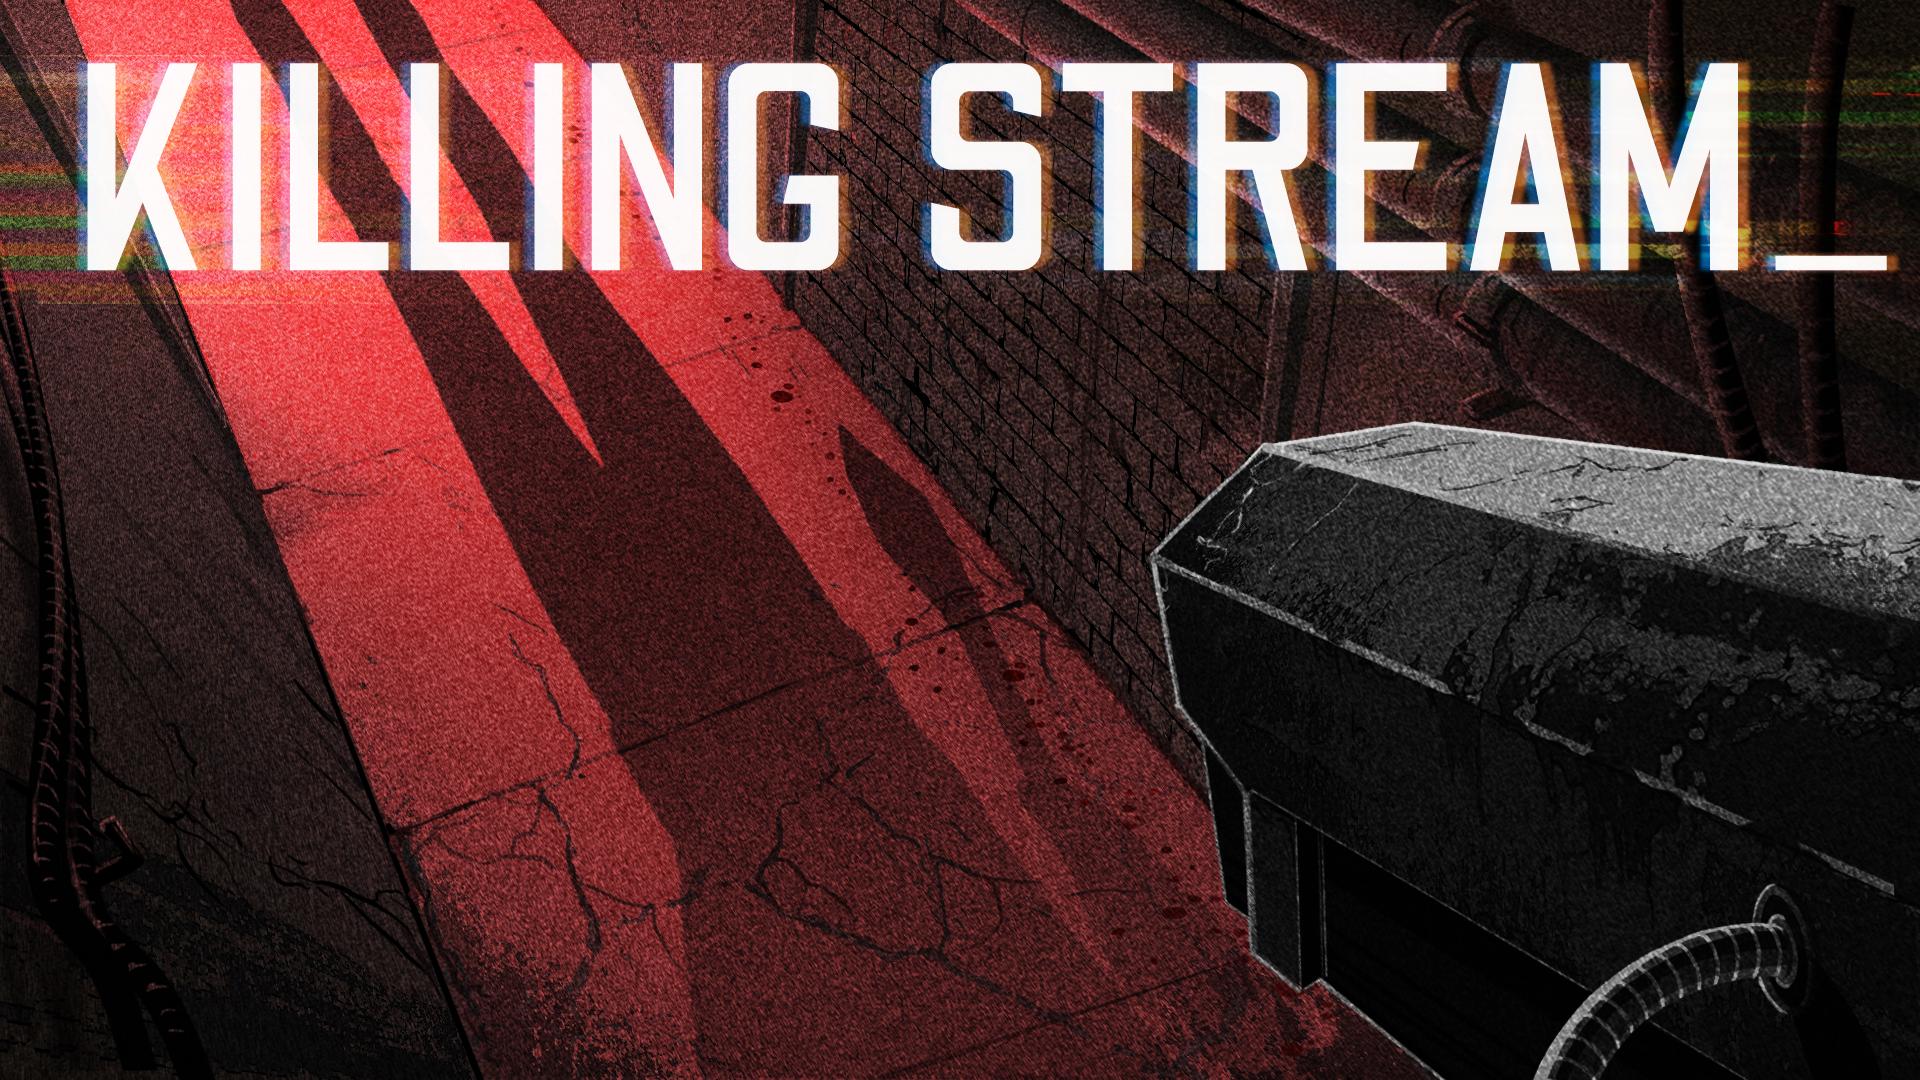 Killing Stream interactive movie by Iron Wolf Studio